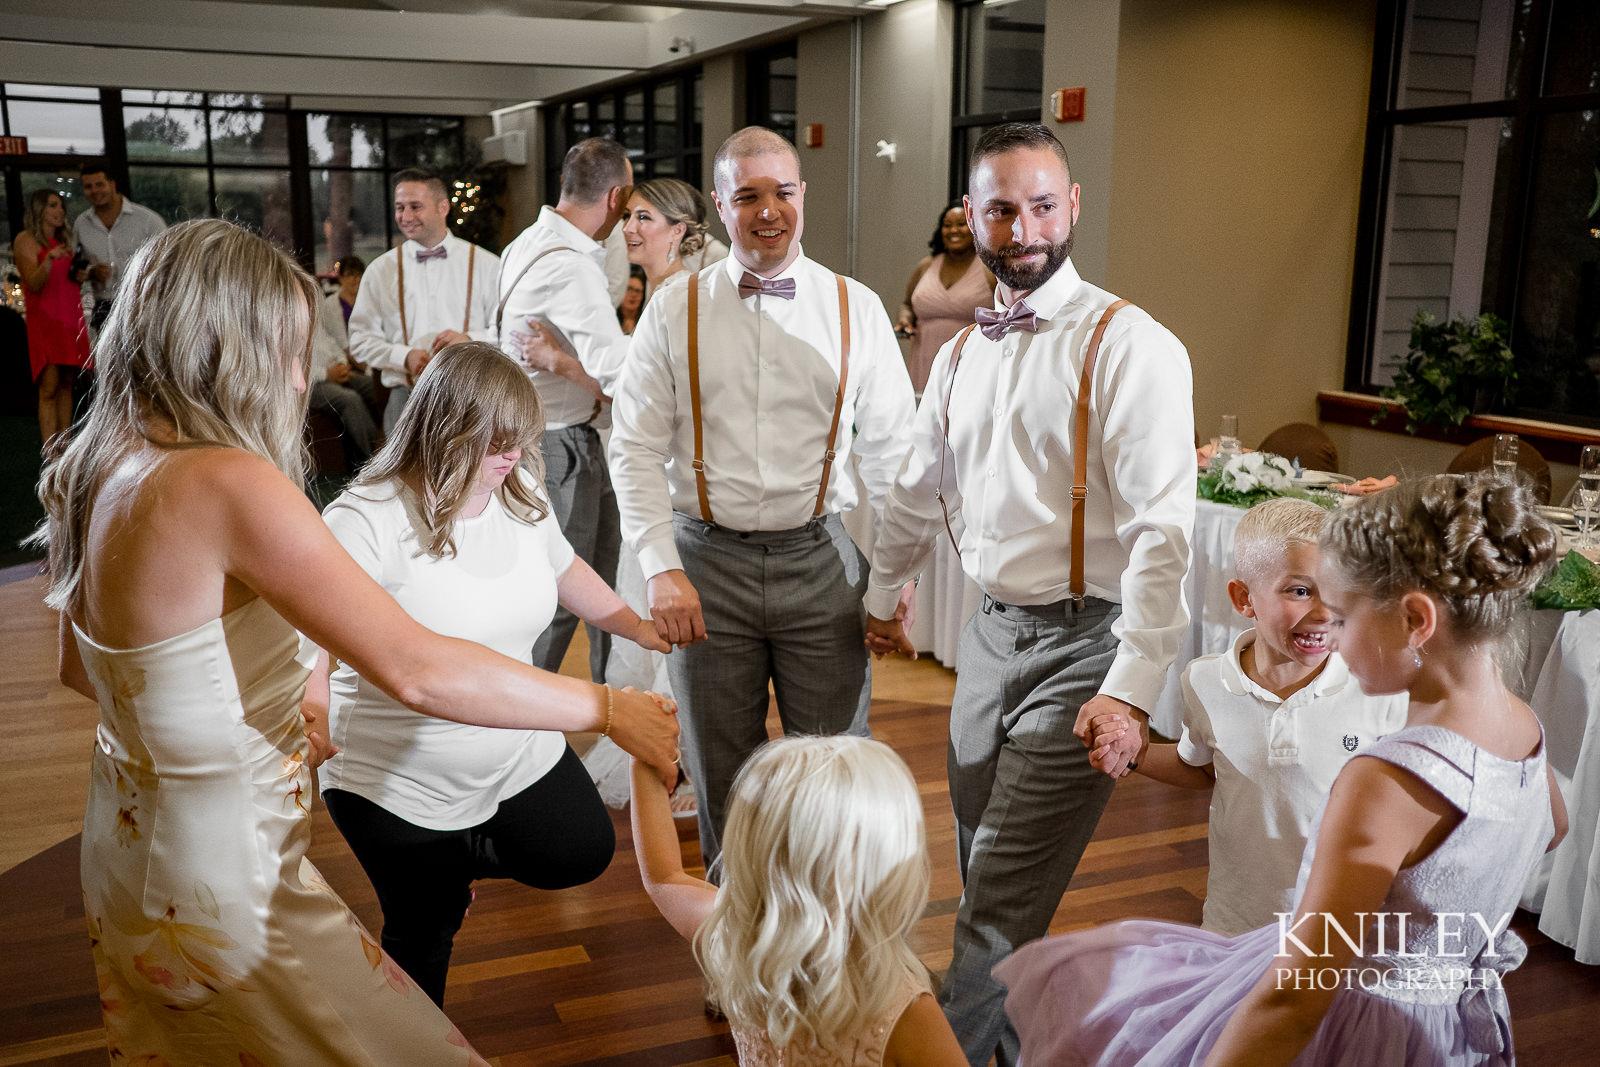 106 - Ontario Golf Club Wedding Pictures - XT2A7373.jpg